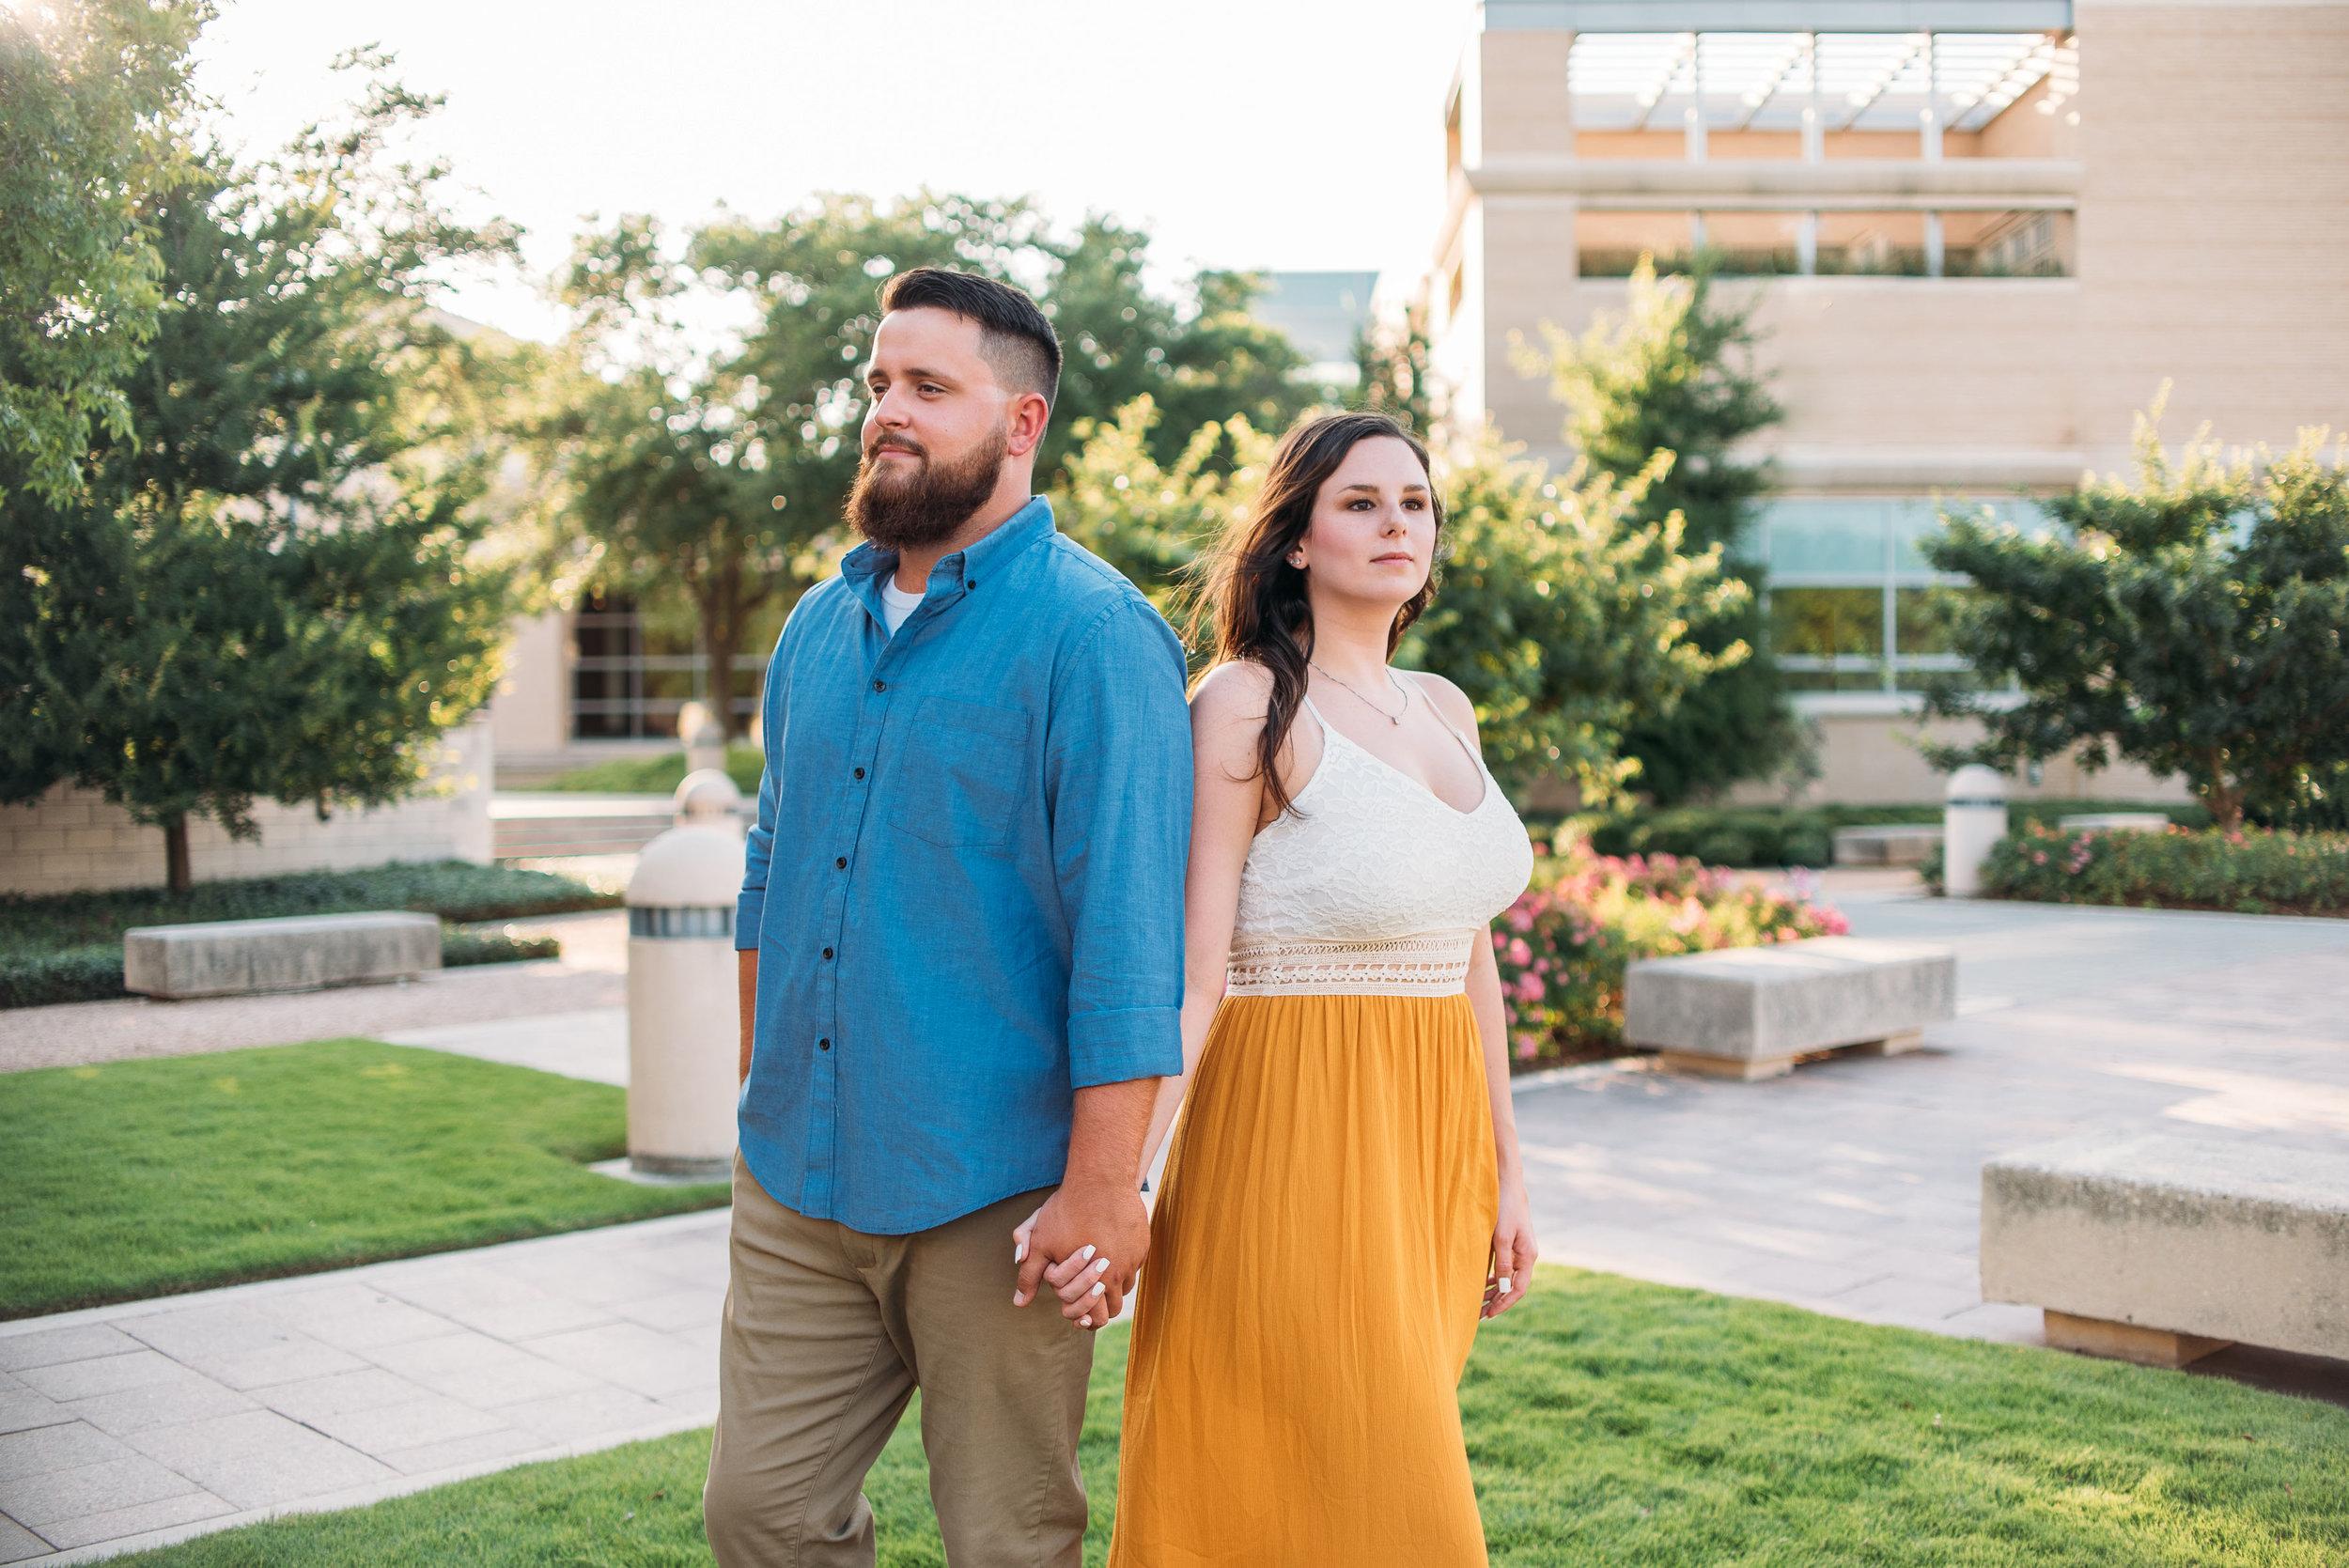 George-Bush-Library-Texas-A&M-University-Engagement-College-Station-Wedding-Photographer-San-Angel-Photo-Mark-Jenna-Matt-Century-Tree-05.jpg